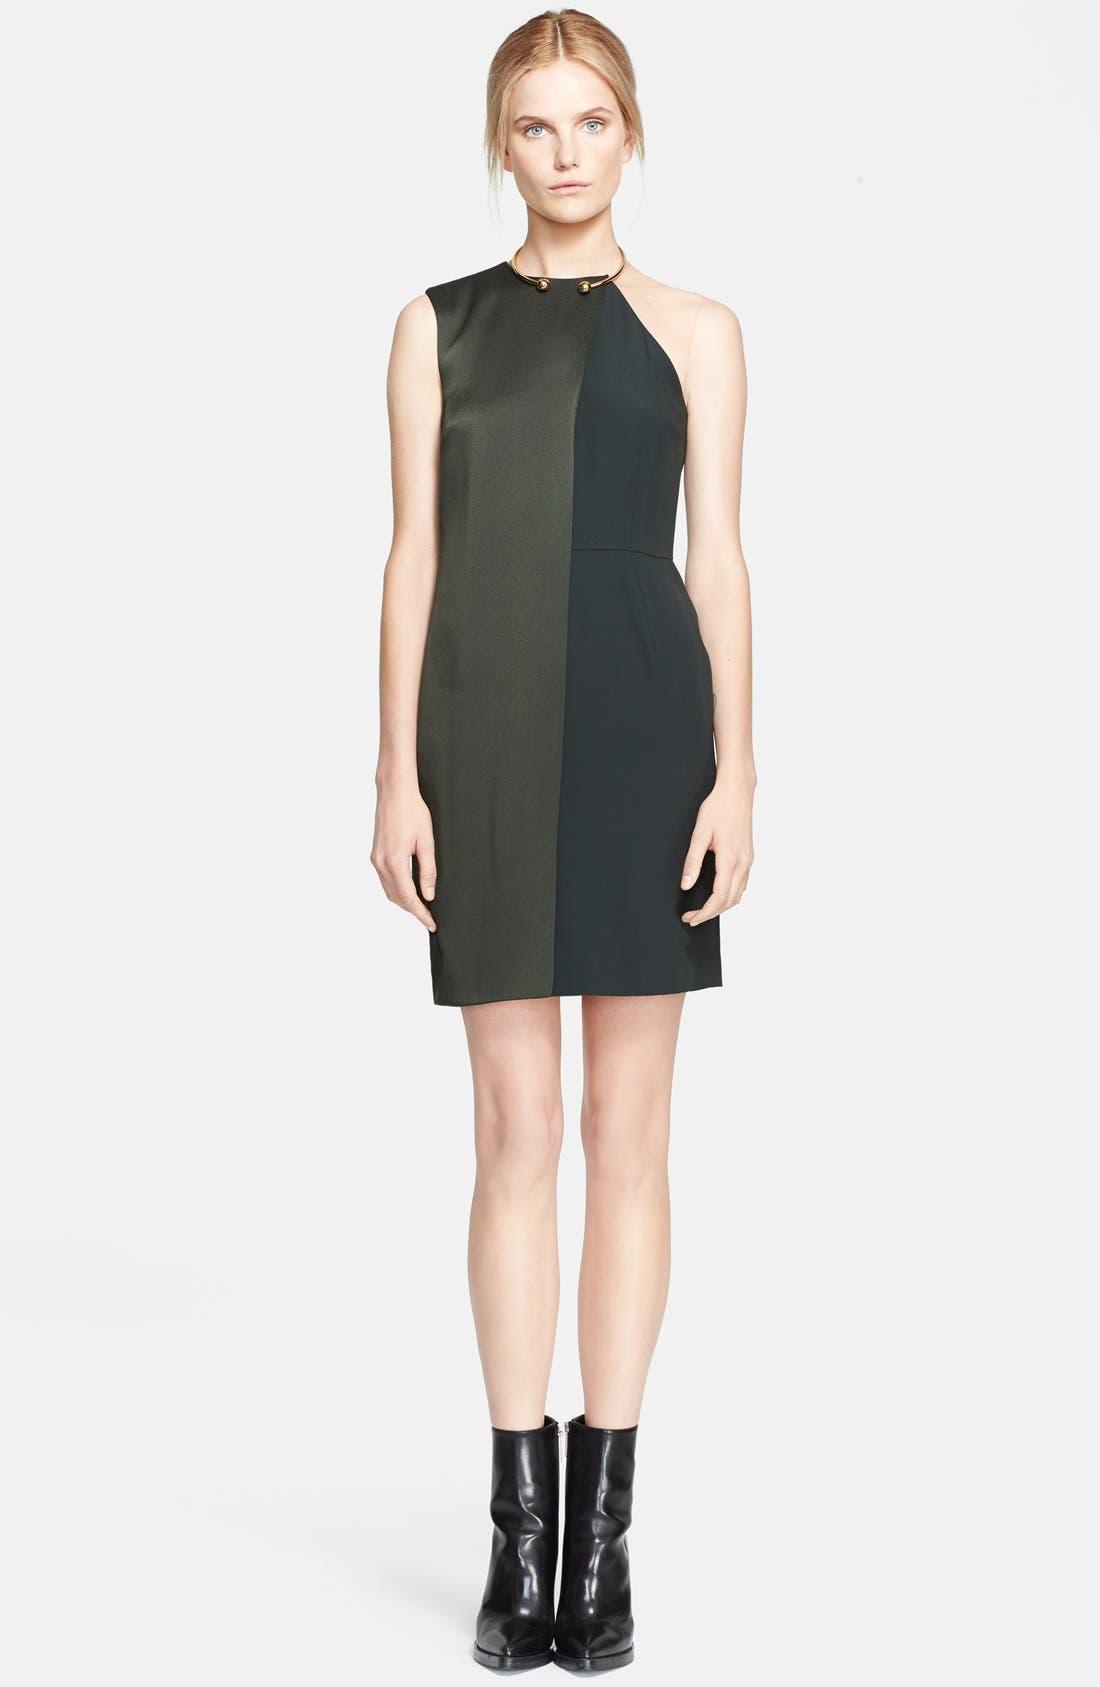 Alternate Image 1 Selected - Stella McCartney Sable Crepe & Satin Dress with Neck Hardware